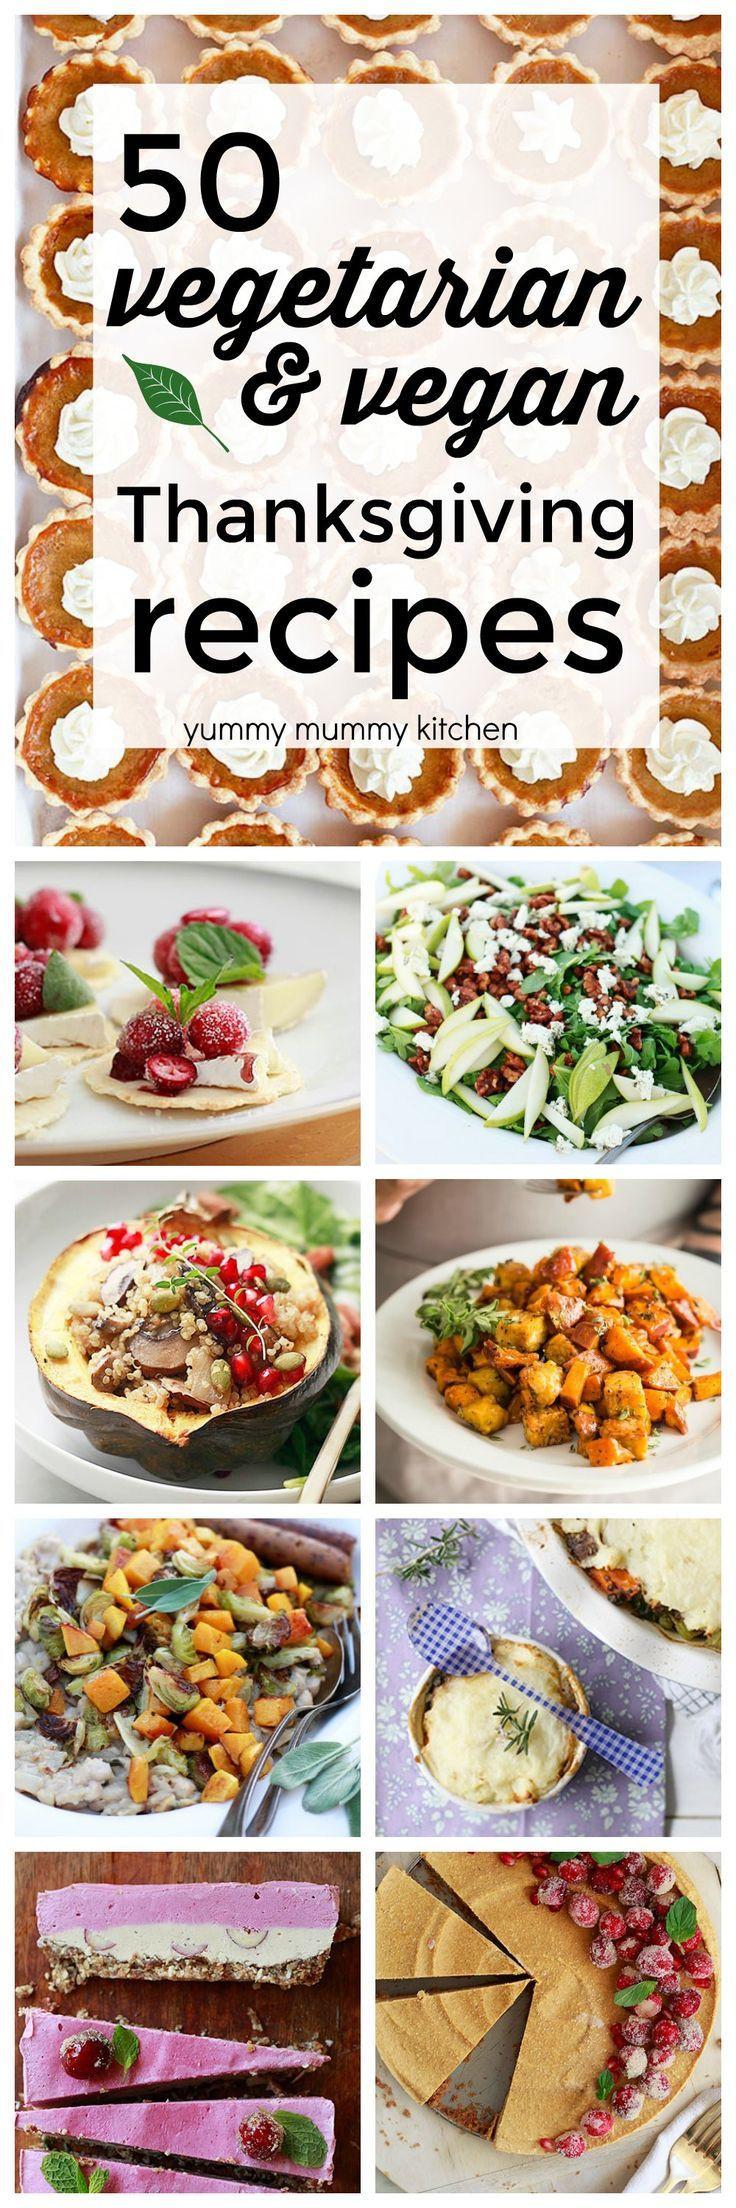 Thanksgiving Dinner Ideas Pinterest  Best 25 Thanksgiving dinner recipes ideas on Pinterest